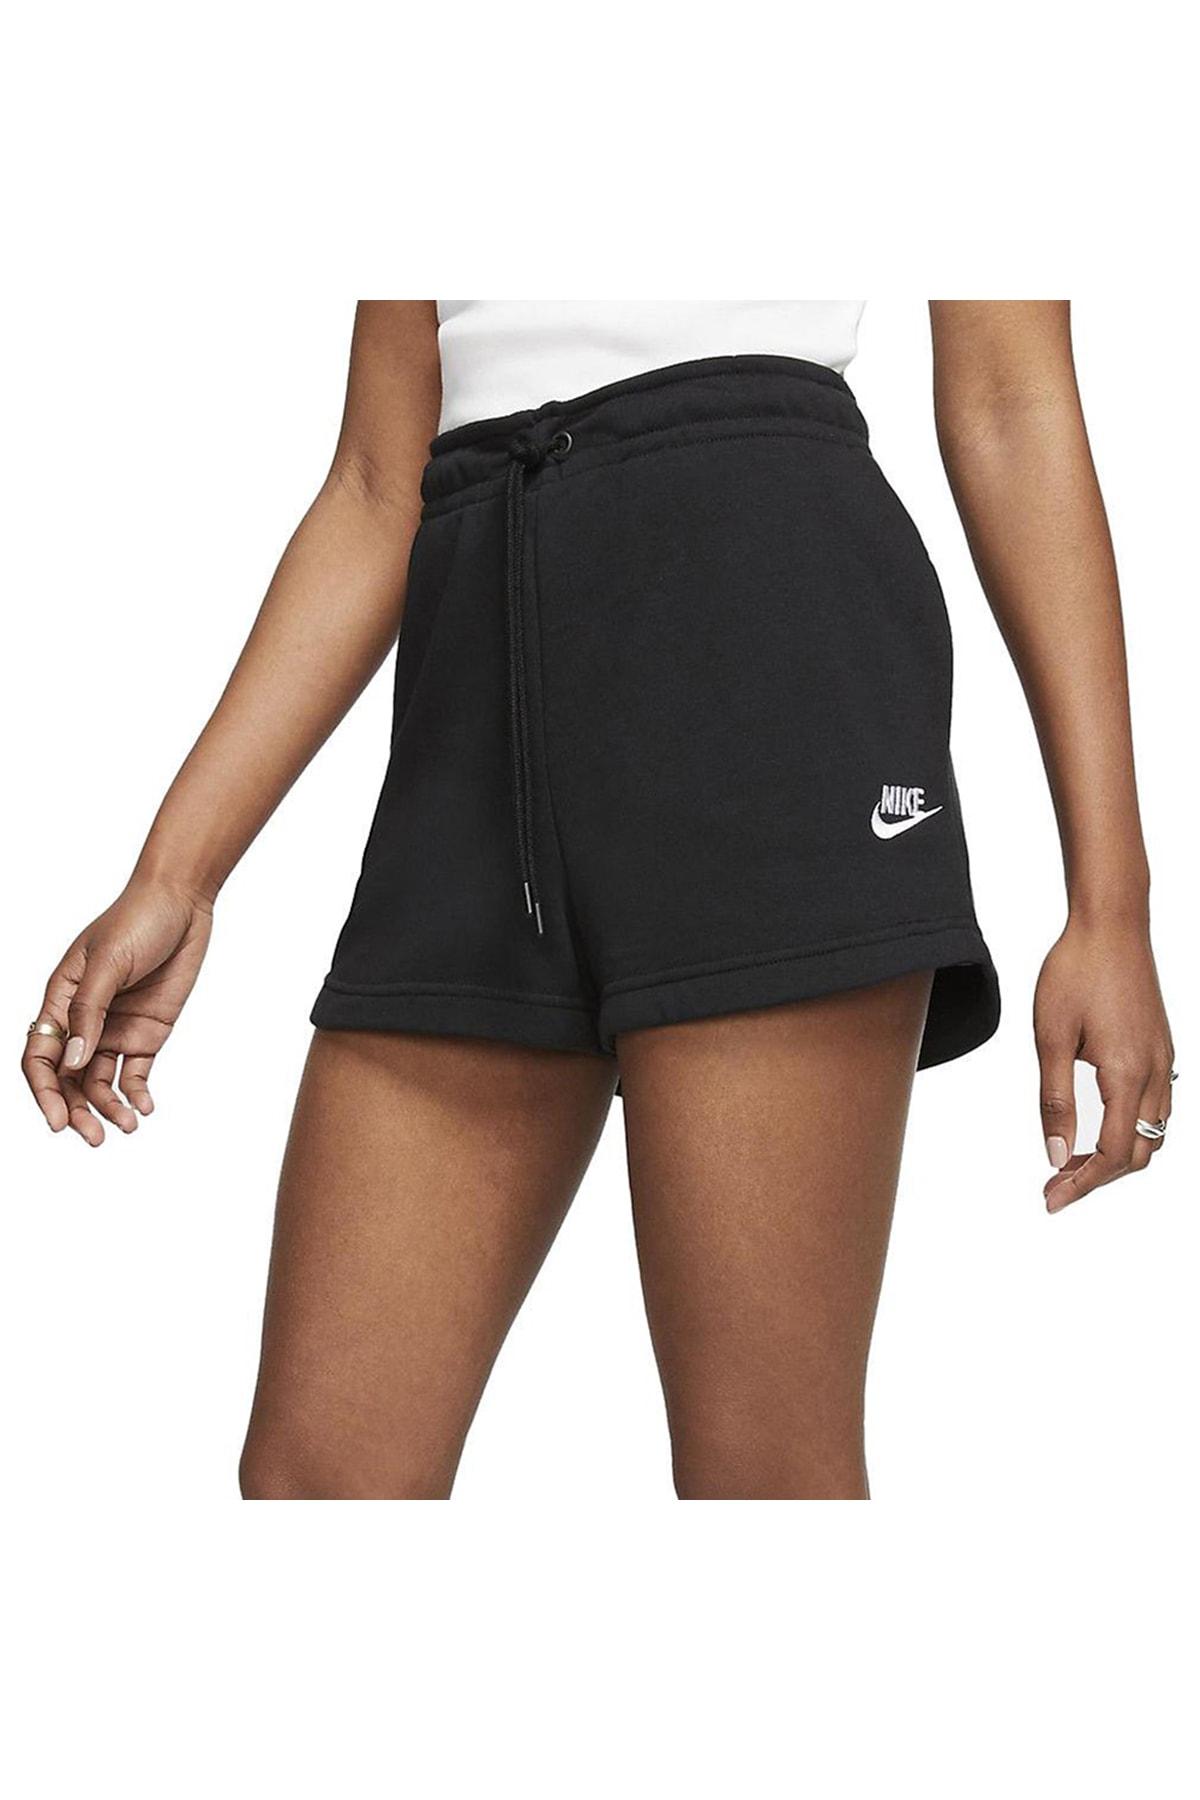 Nike CJ2158-010 Sportswear Şort